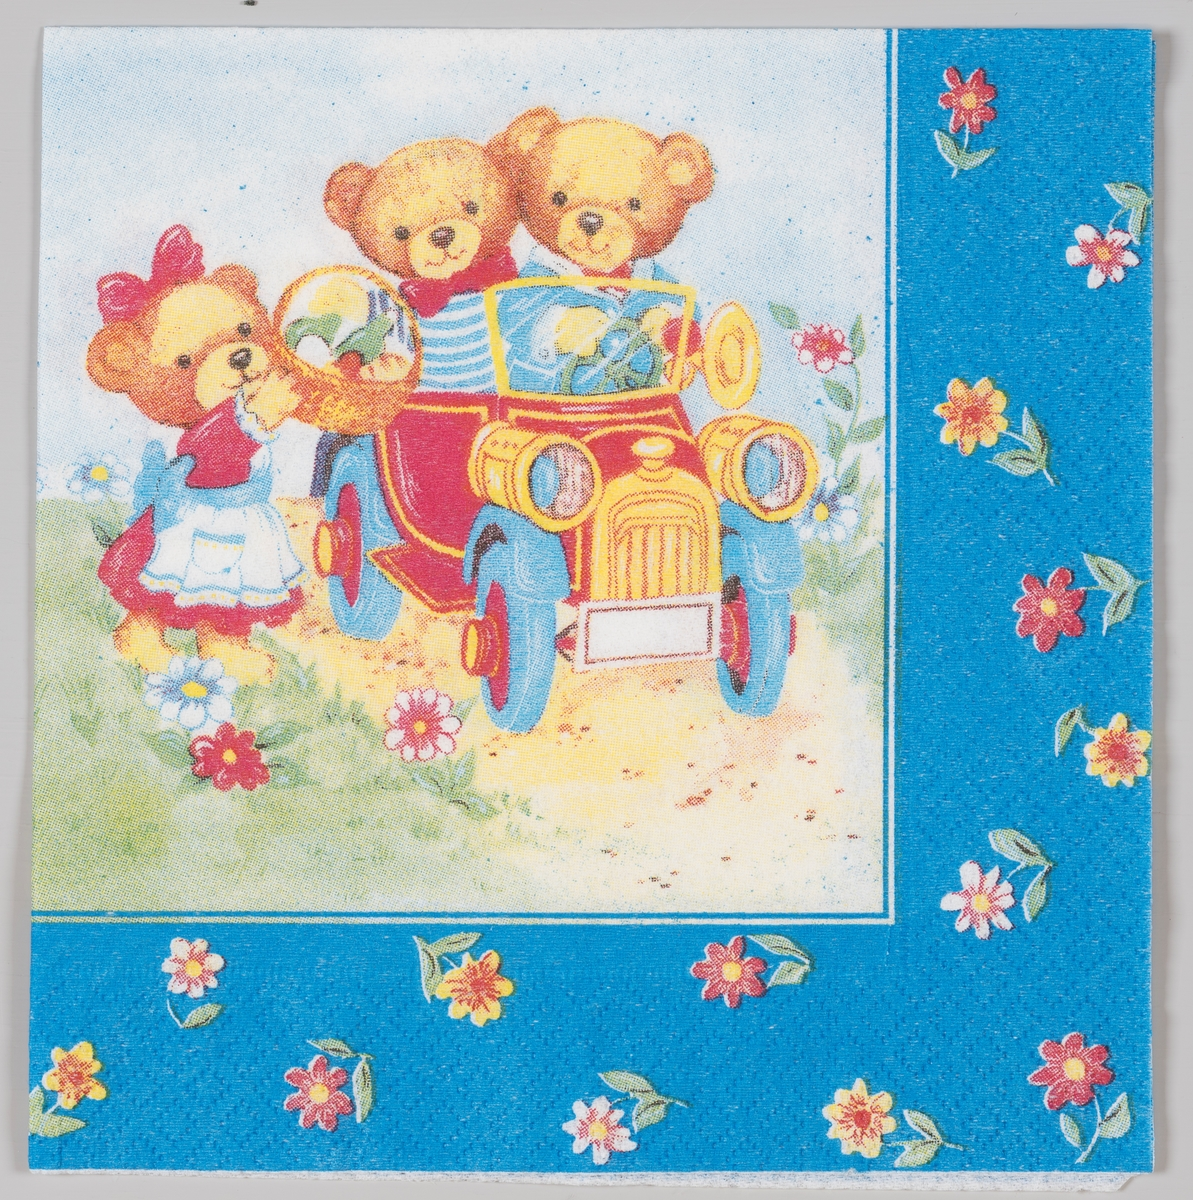 To teddybjørner sitter i en veteranbil, mens en jente teddybjørn gir dem en piknik kurv